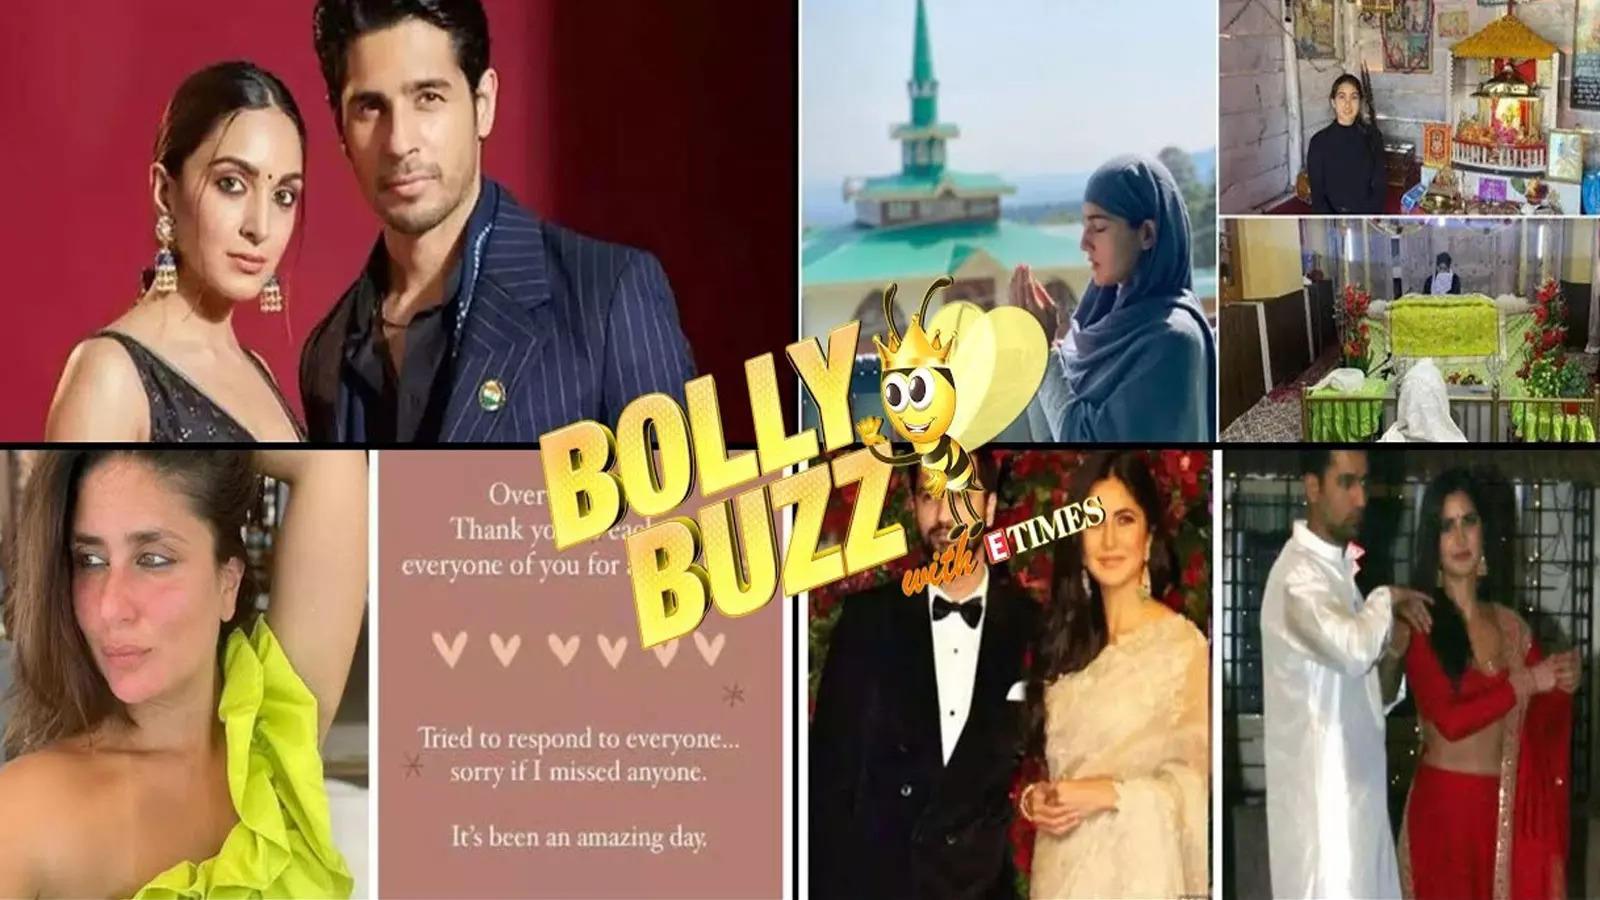 bolly-buzz-sidharth-malhotra-breaks-his-silence-on-wedding-plans-sara-ali-khan-shares-a-glimpse-of-her-vacation